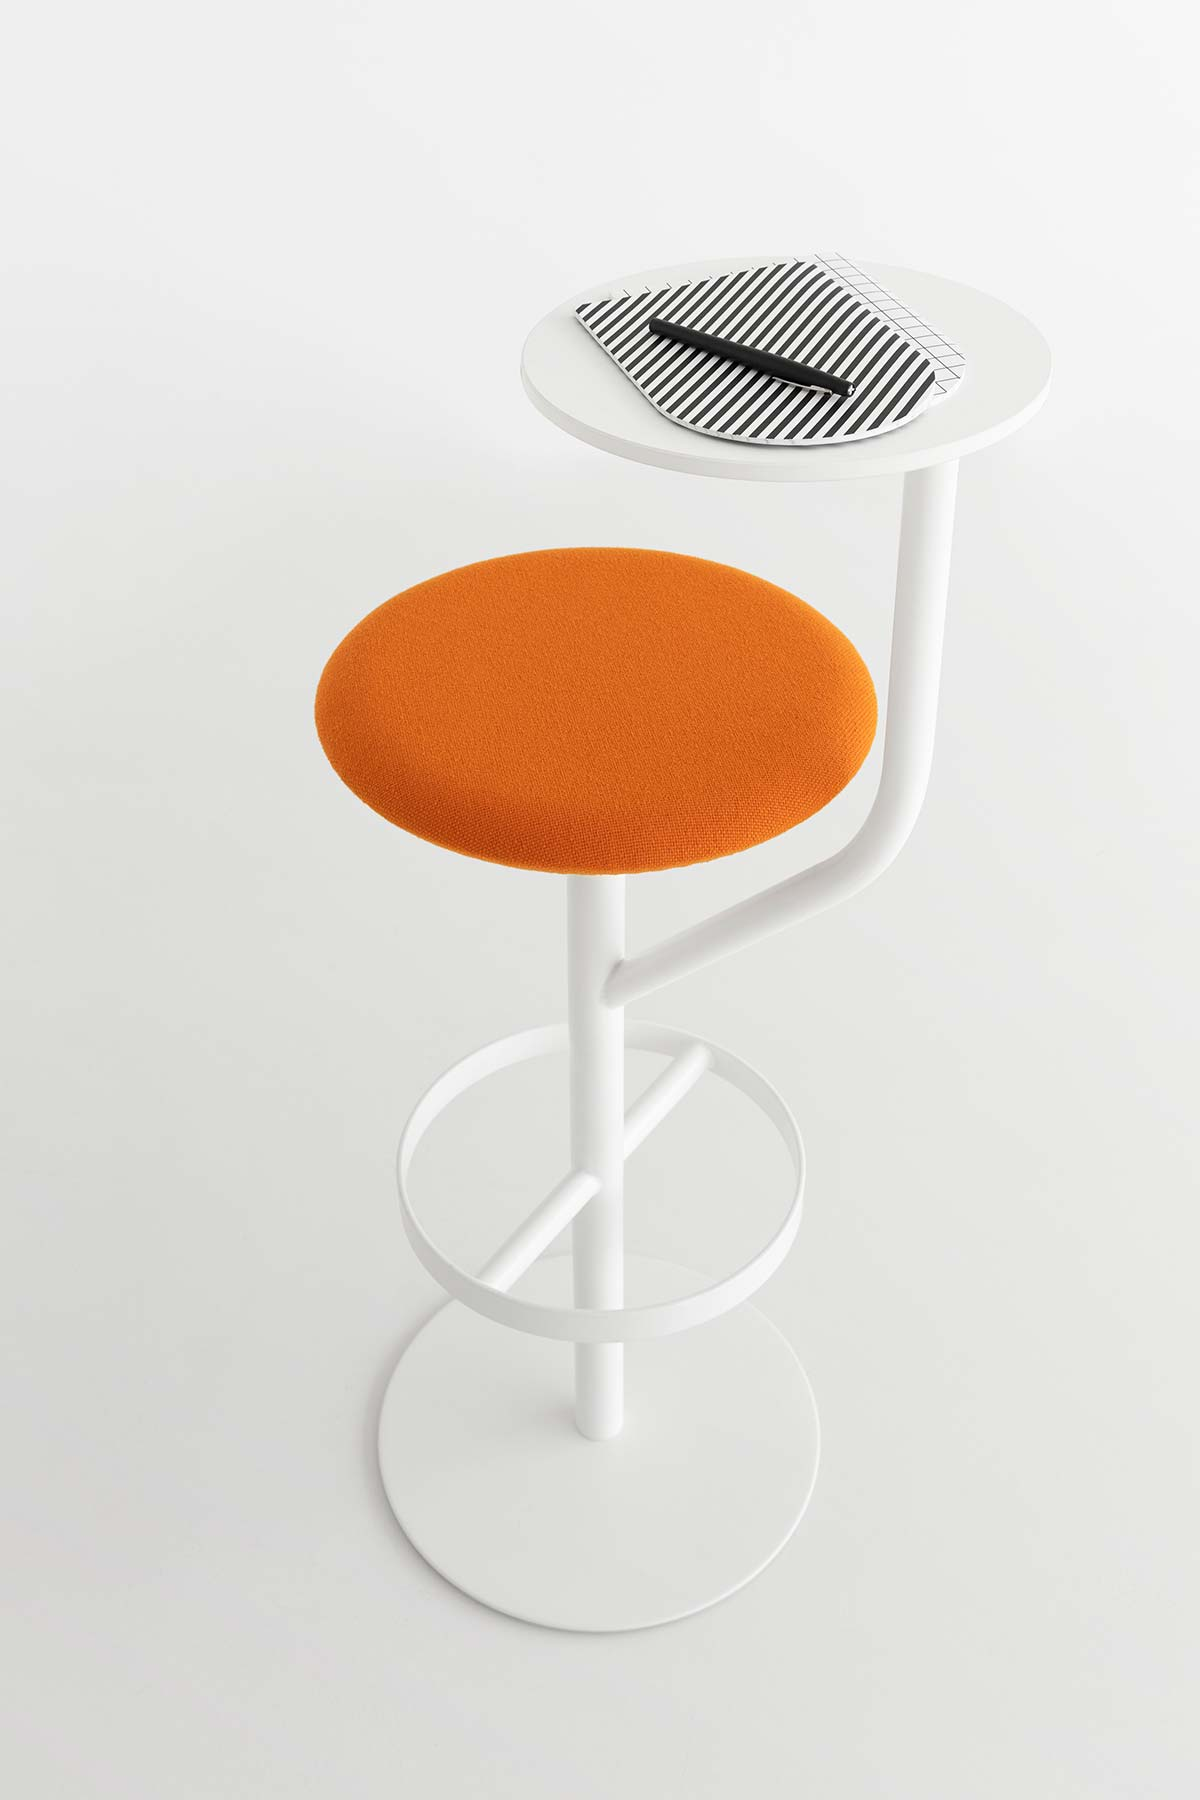 Aaron by Lapalma, Design Pio&TitoToso